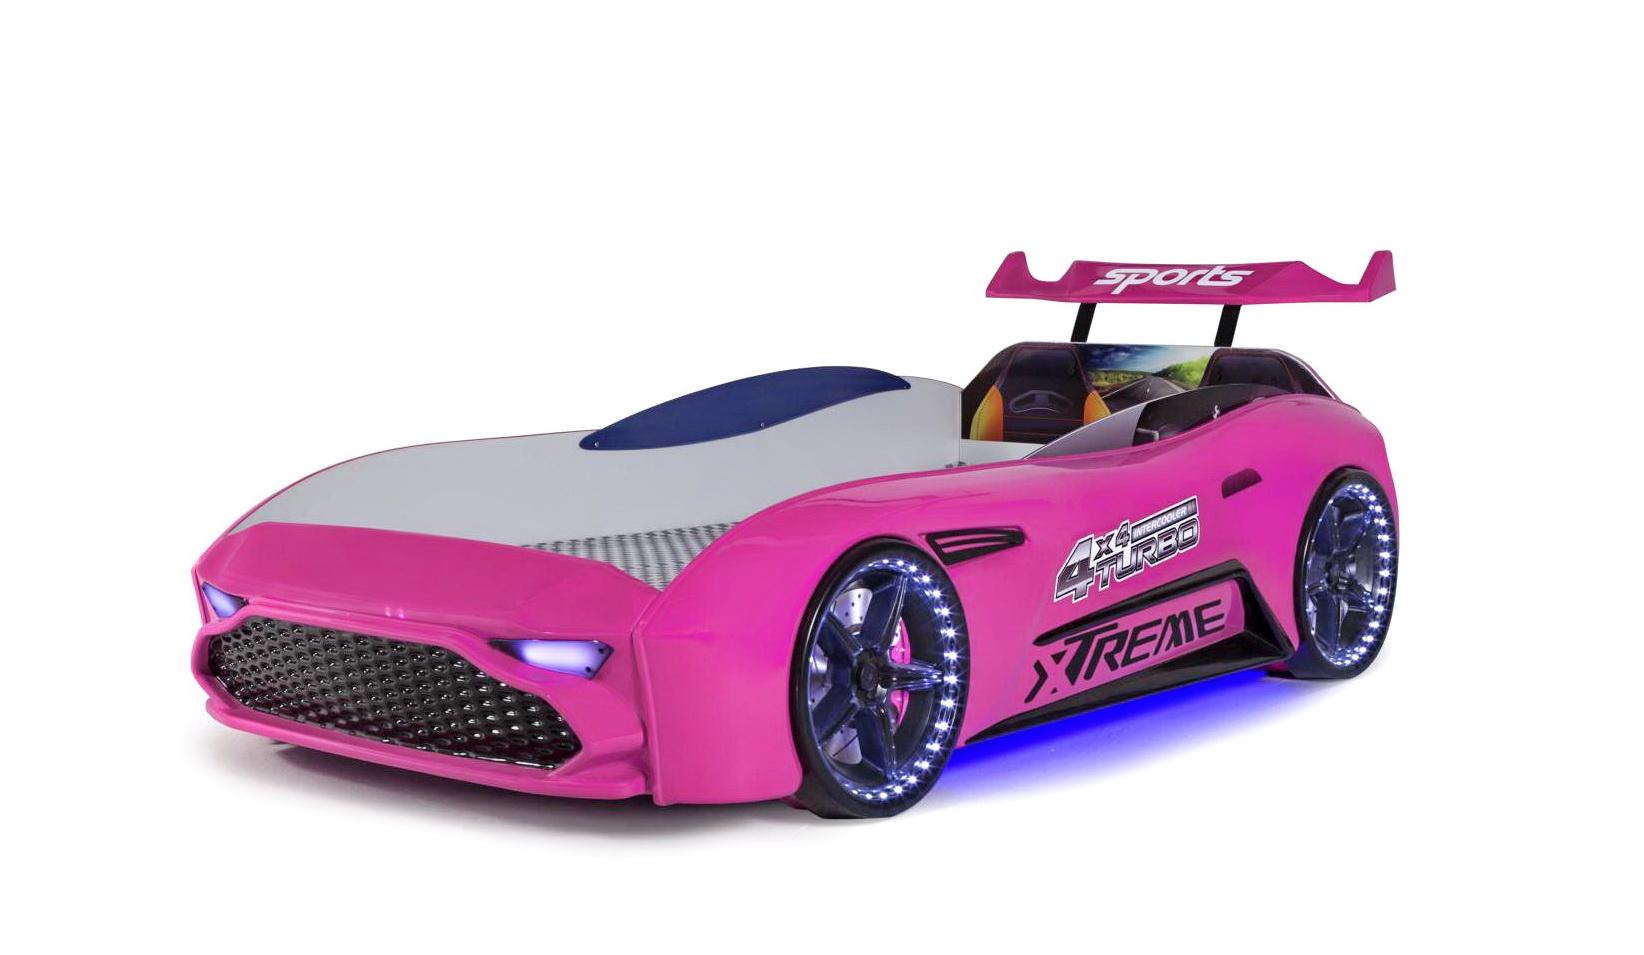 Autobett GT18 Turbo 4x4 Extreme Pink mit Bluetooth